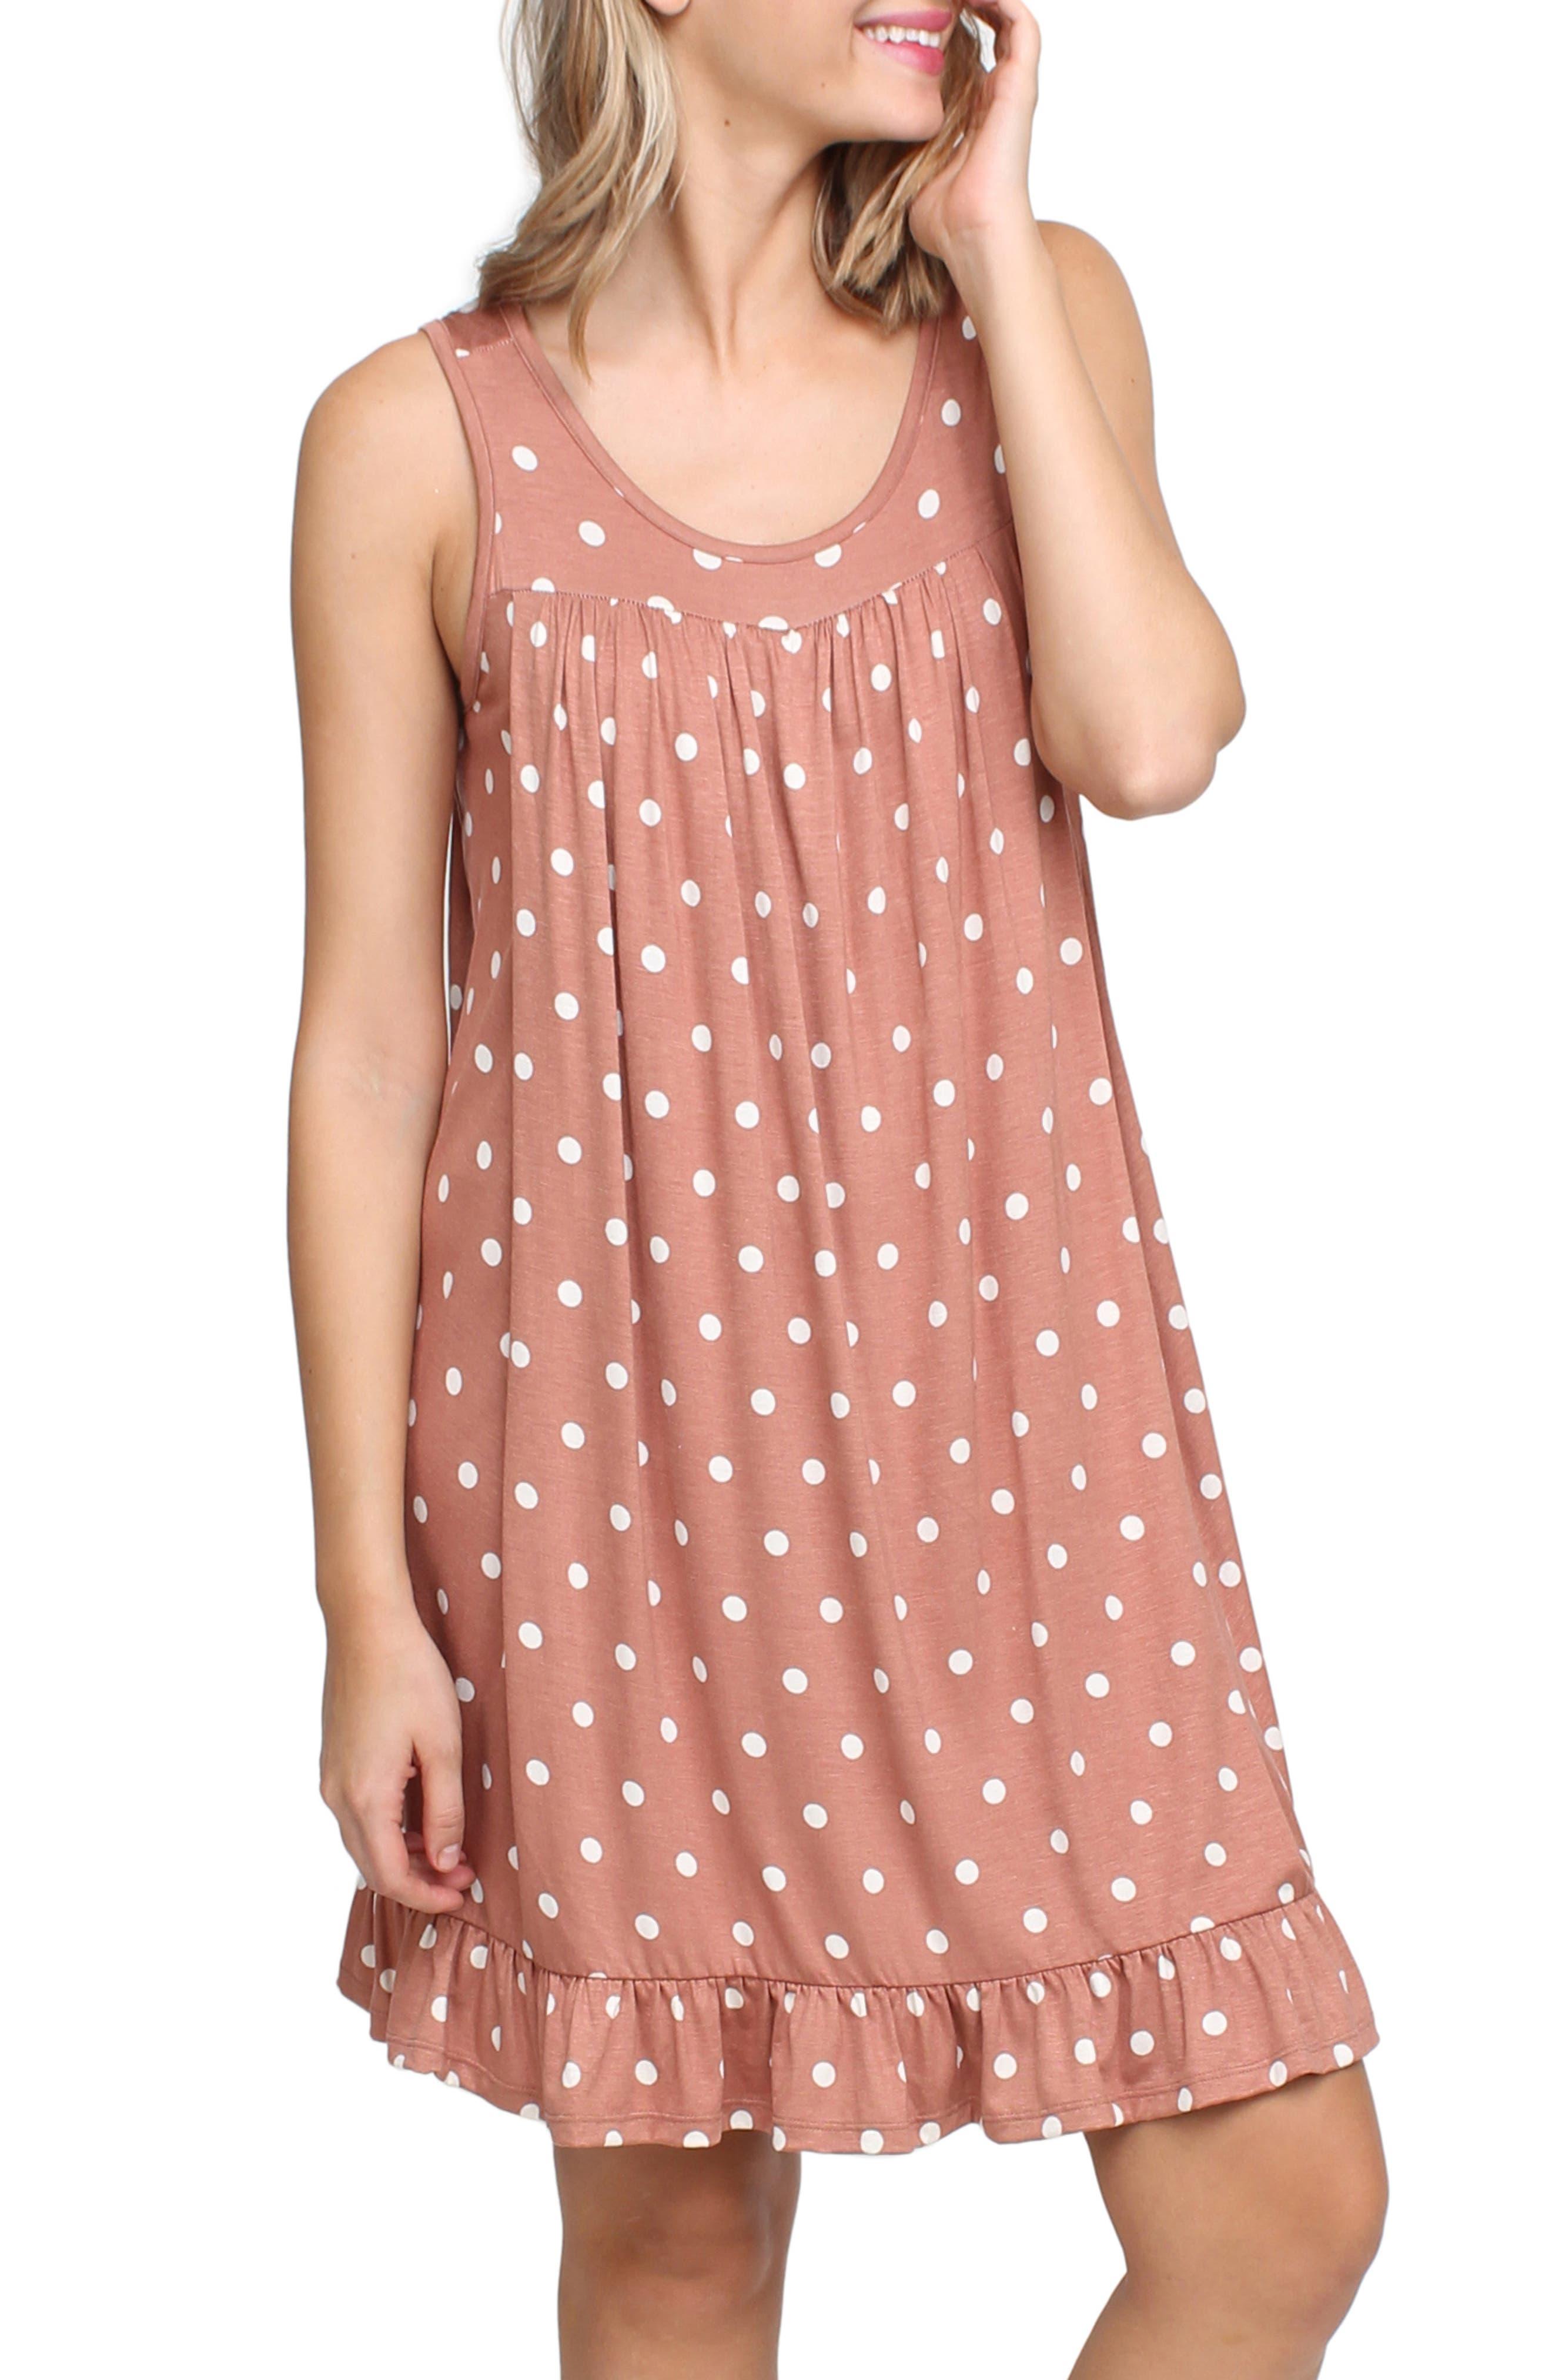 SAVI MOM, Paris Maternity/Nursing Nightgown, Main thumbnail 1, color, MAUVE POLKA DOT